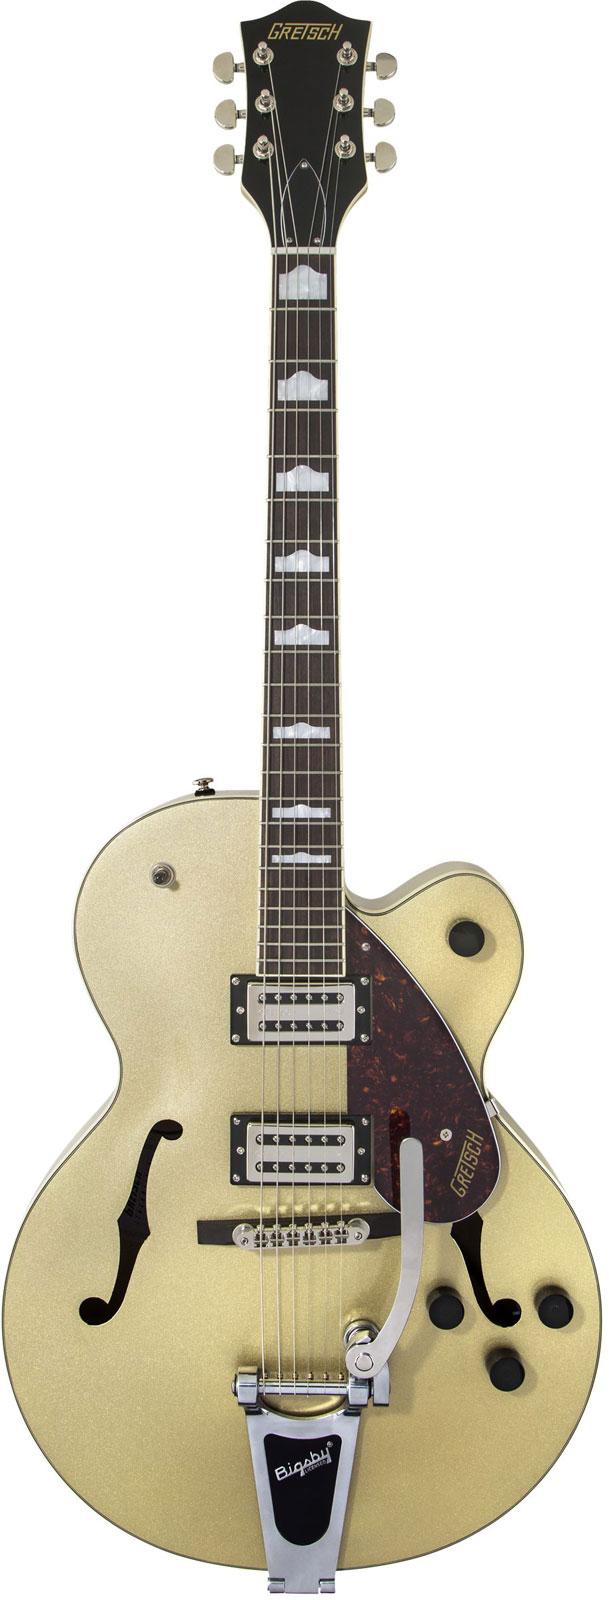 Gretsch Guitars G2420t Hlw Sc Gldst